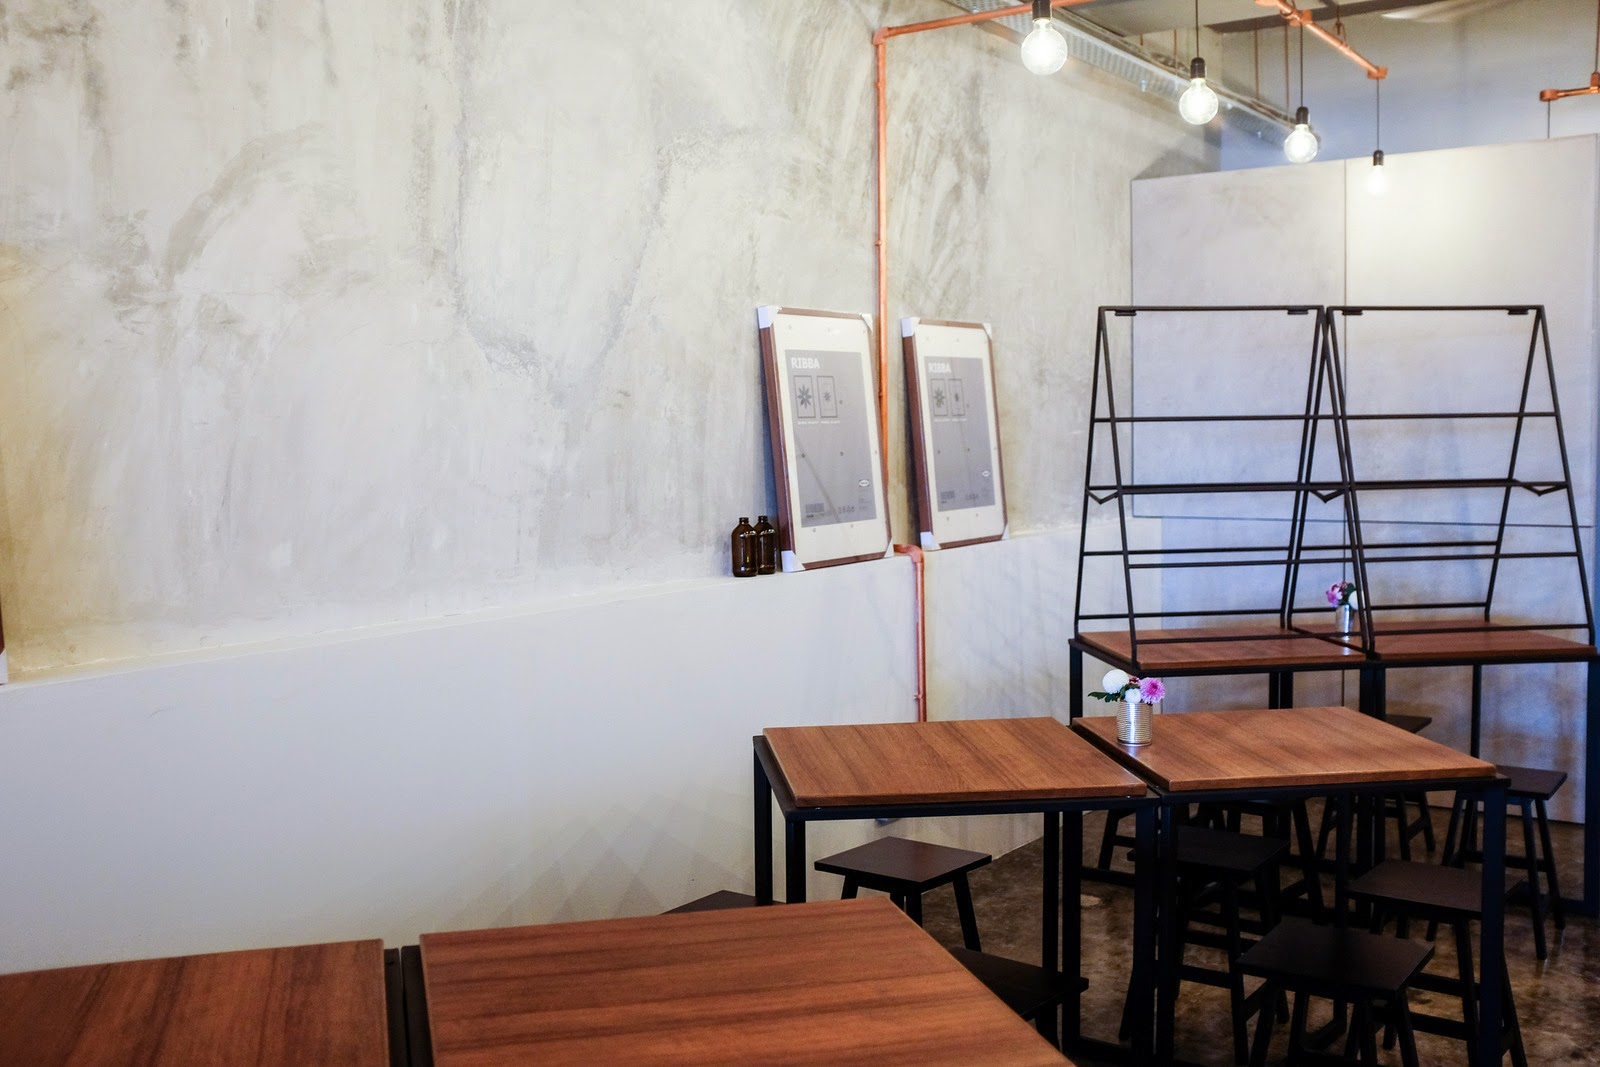 Italian Restaurants Near Bna